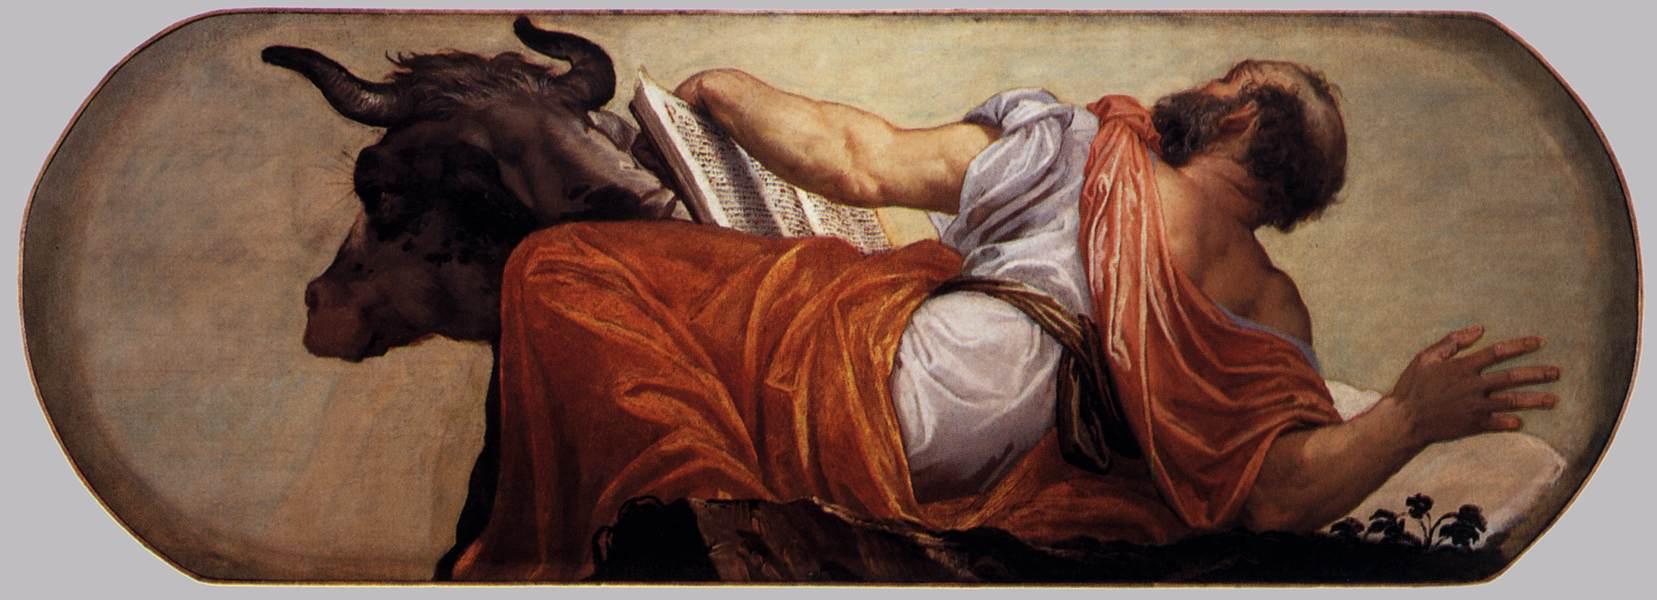 Paolo Veronese - St Luke - WGA24797.jpg